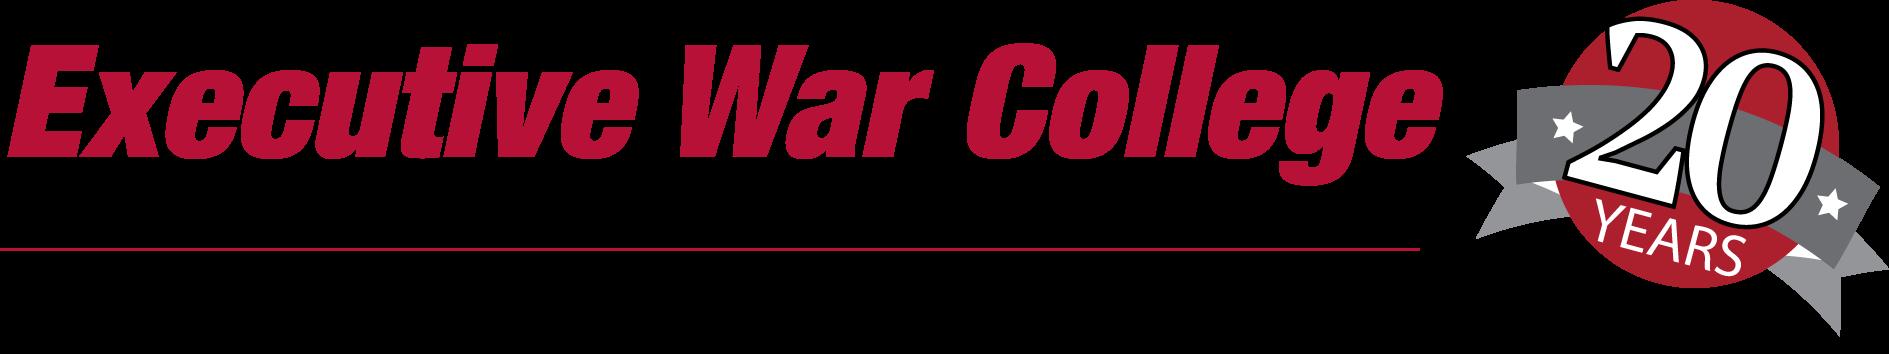 ewc-20yrs-sponsor